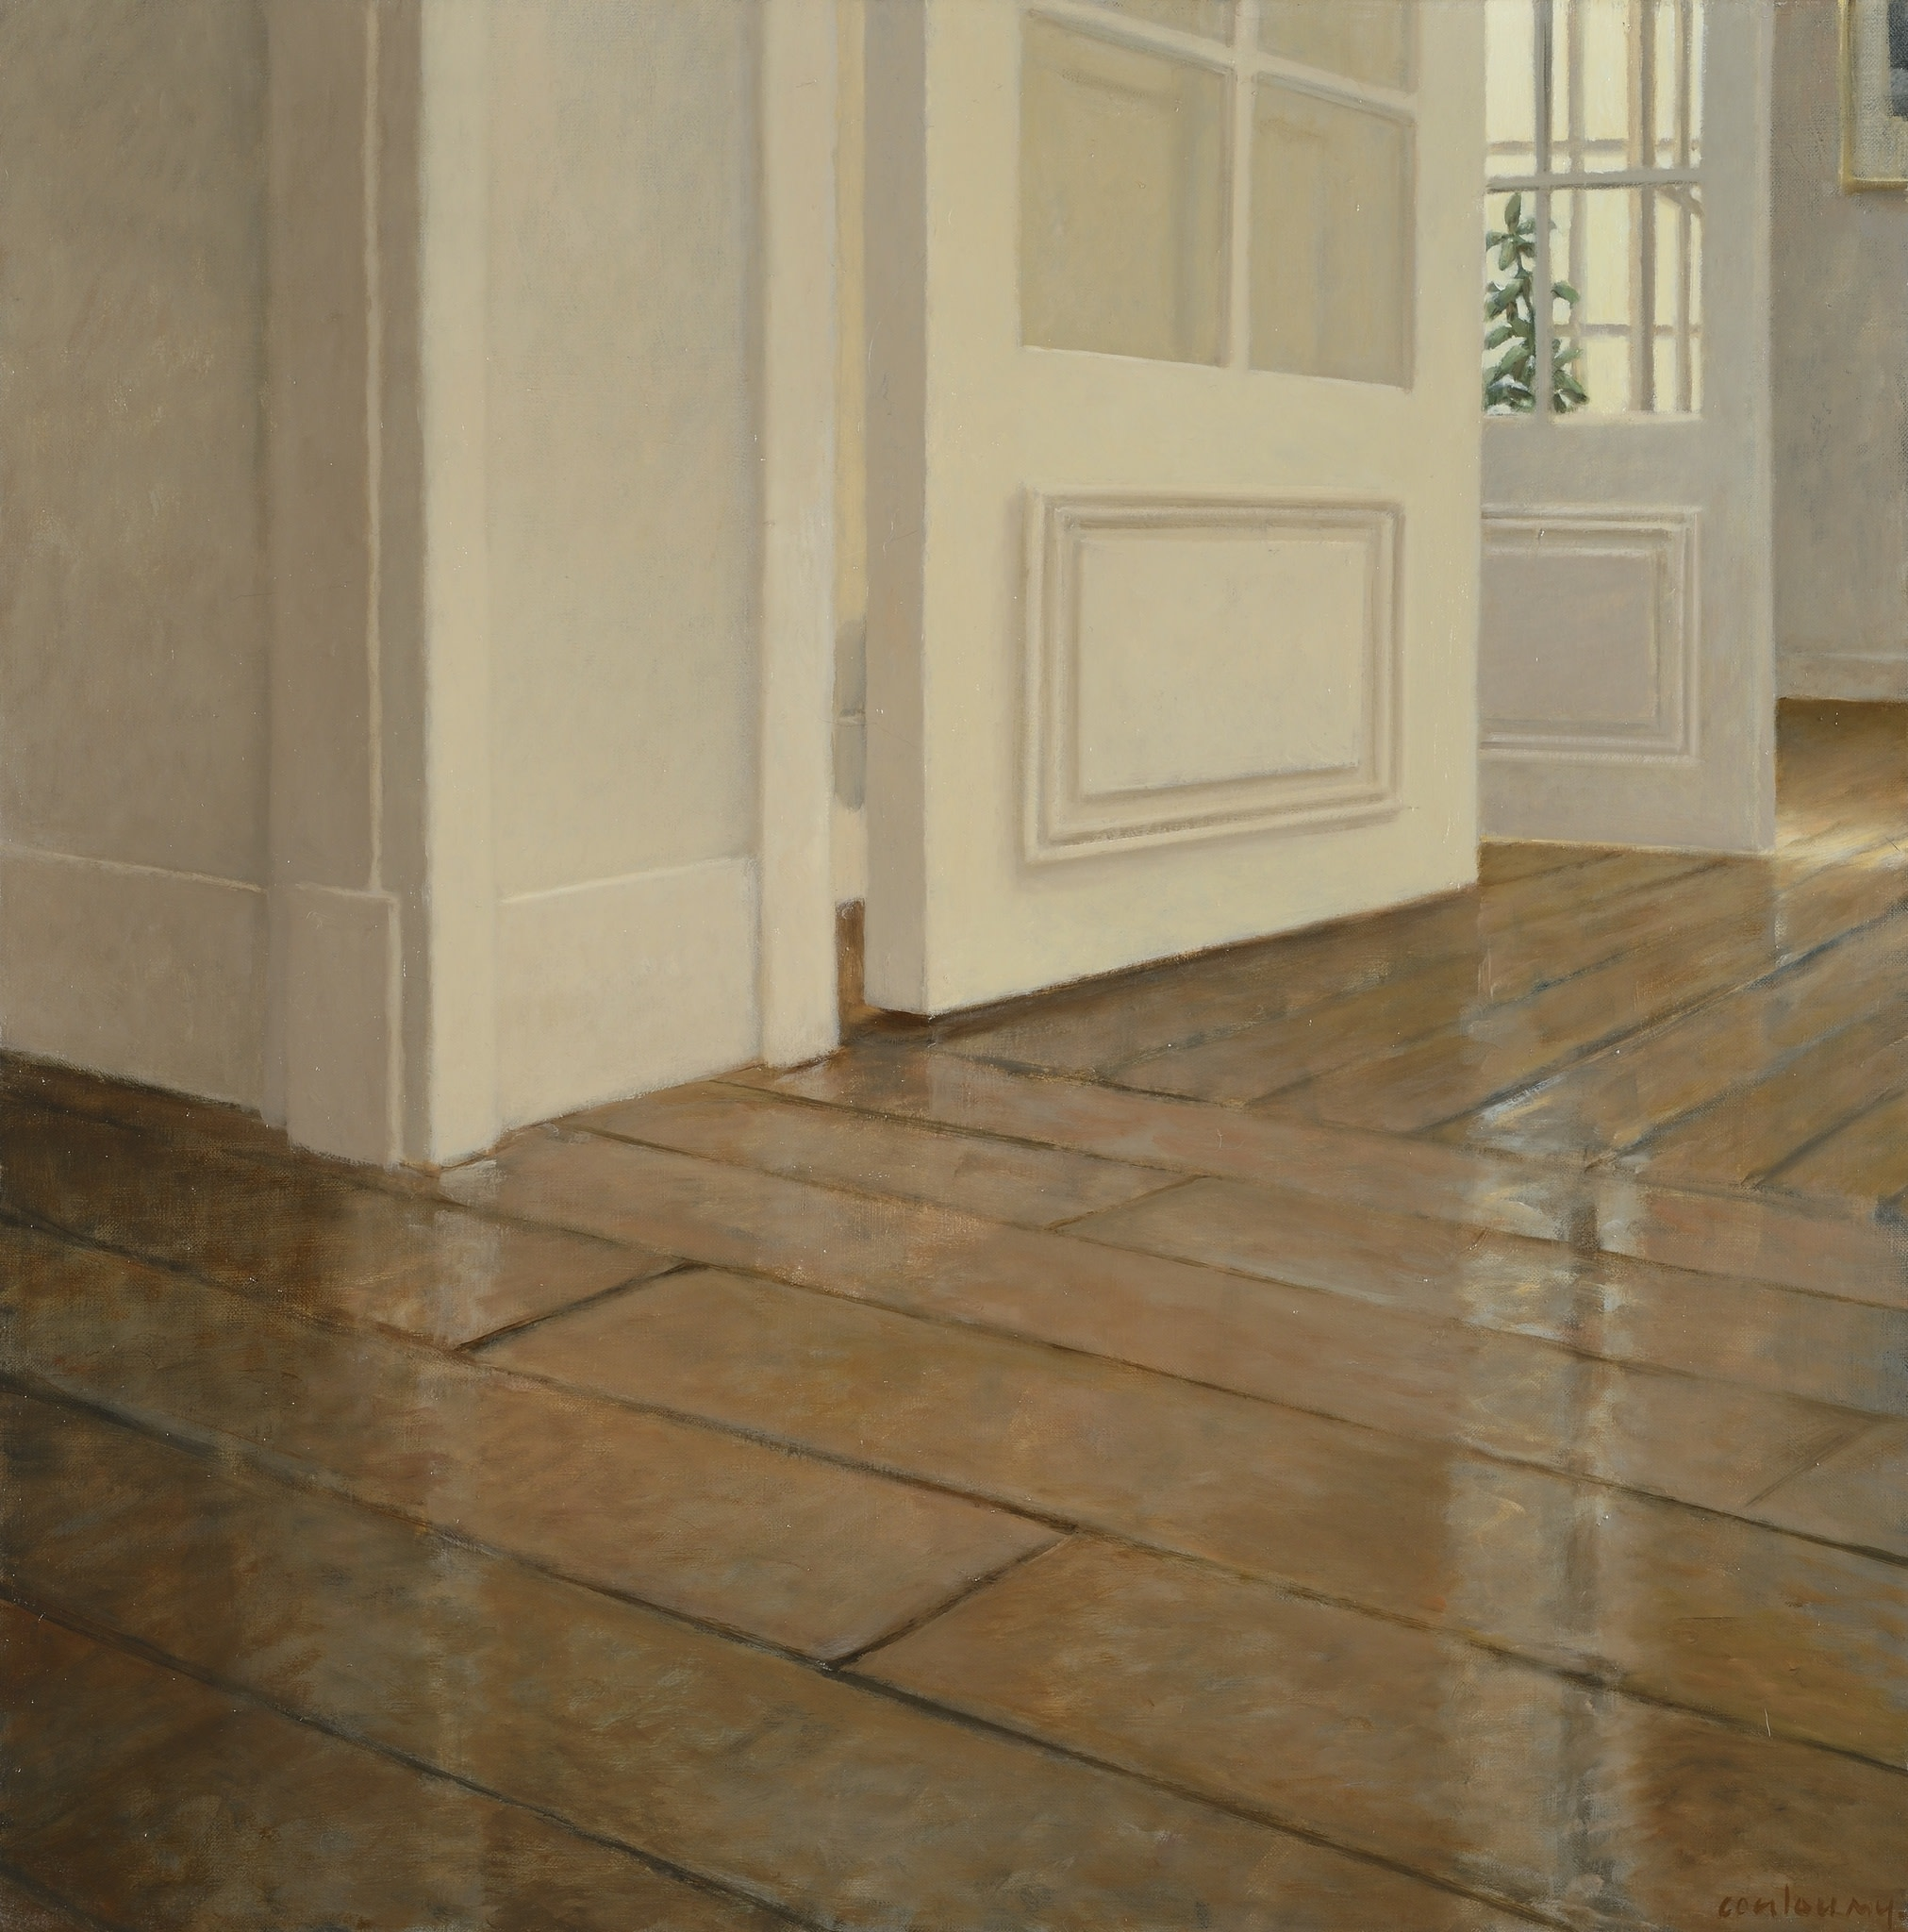 "<span class=""link fancybox-details-link""><a href=""/exhibitions/40/works/artworks86/"">View Detail Page</a></span><div class=""artist""><strong>Anne-Françoise Couloumy</strong></div><div class=""title""><em>Les Parquets Rue Daru 3</em>, 2014</div><div class=""medium"">Oil on Canvas</div><div class=""dimensions"">50 x 50 cm<br>19 3/4 x 19 3/4 in.</div>"